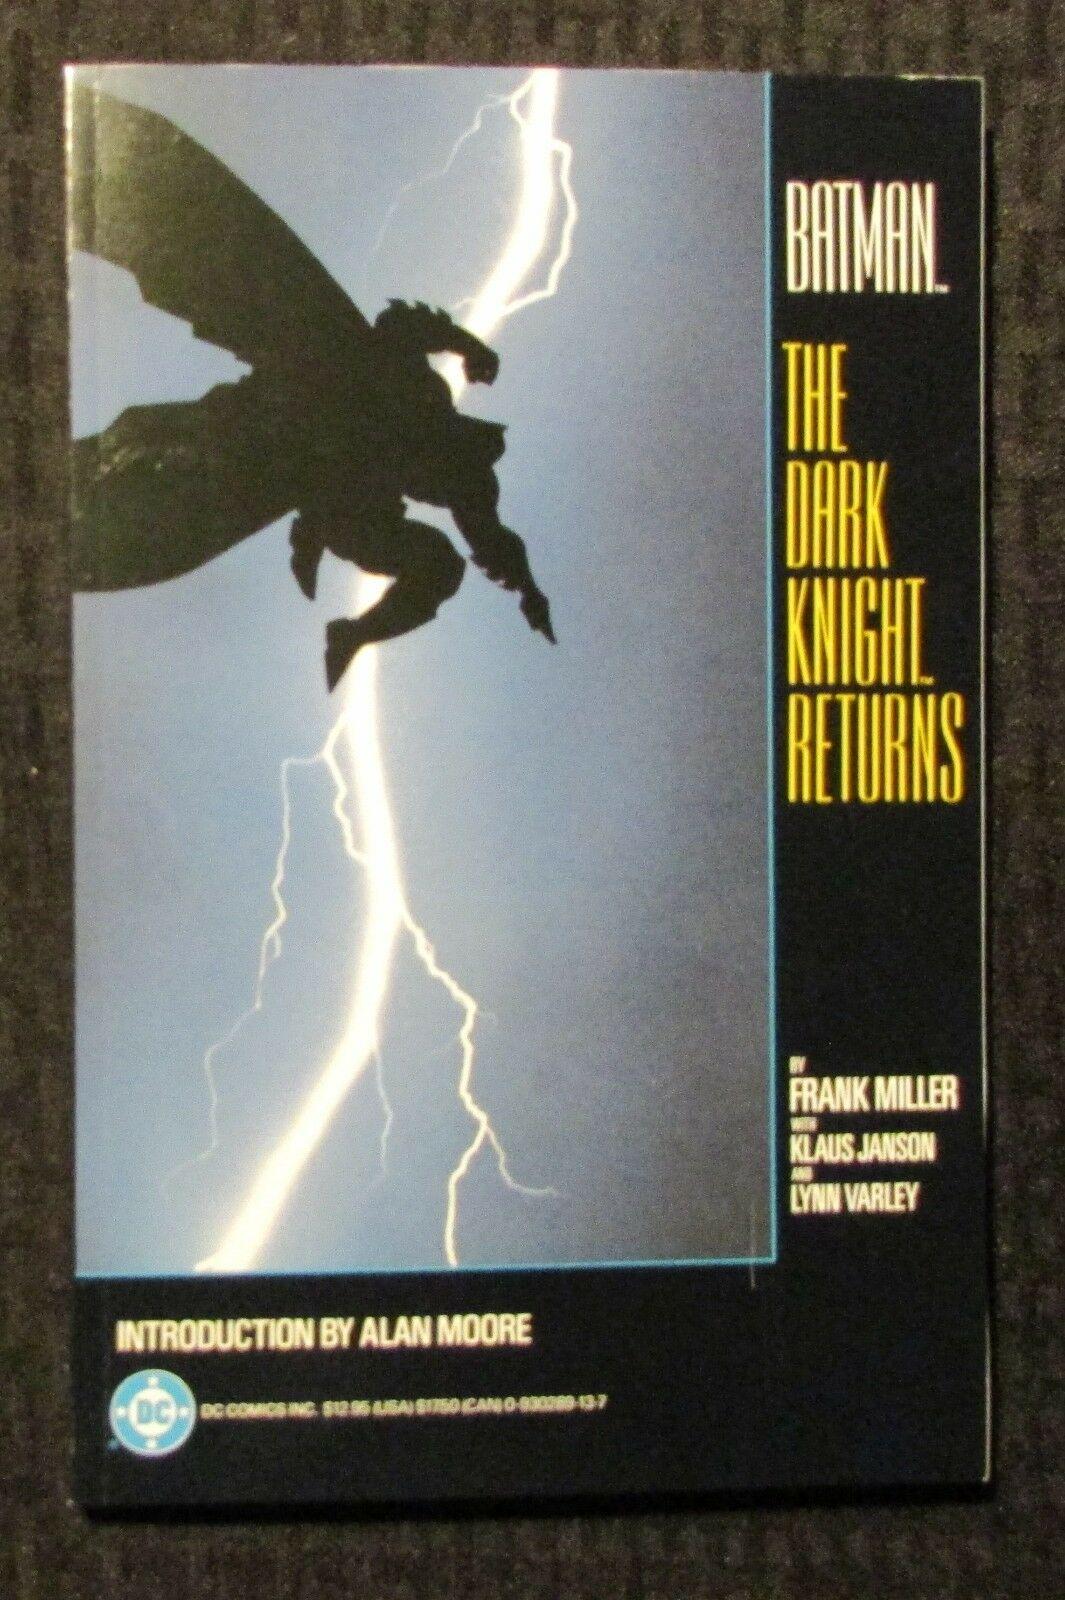 1986 BATMAN The Dark Knight Returns TPB 1st Printing VF- 7.5 Frank Miller